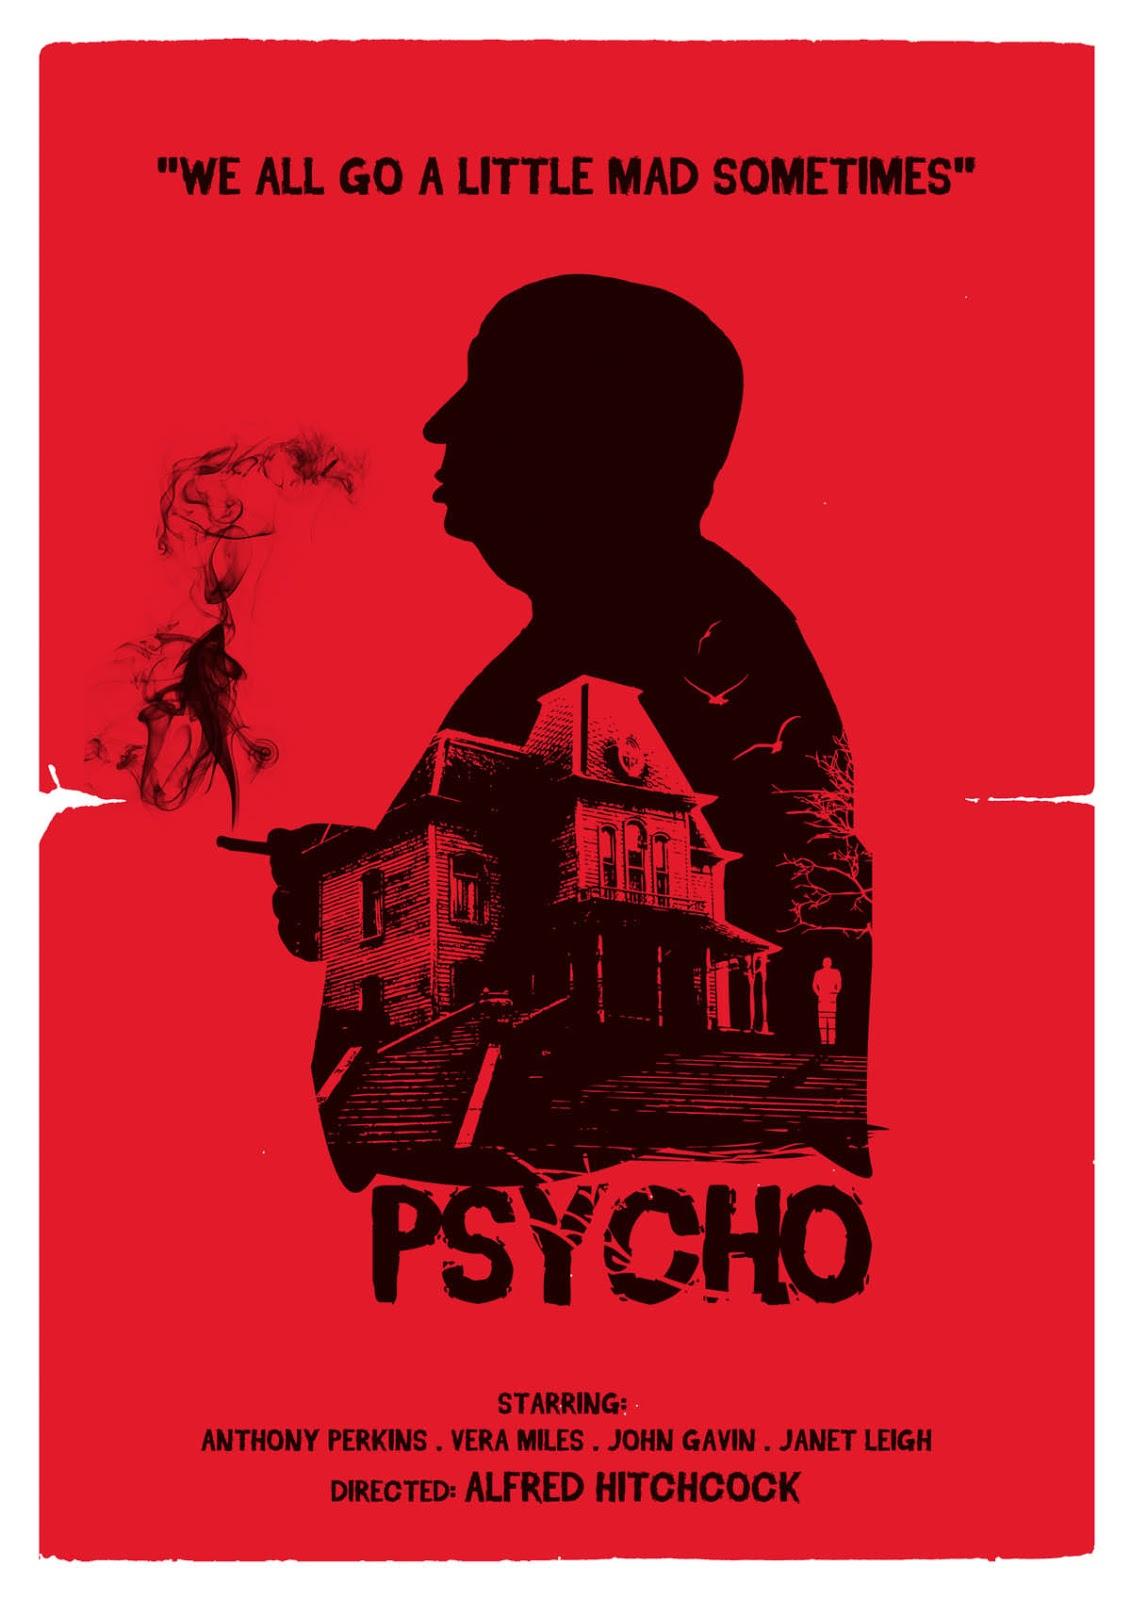 Hitchcock's 1960 'Psycho' film analysis